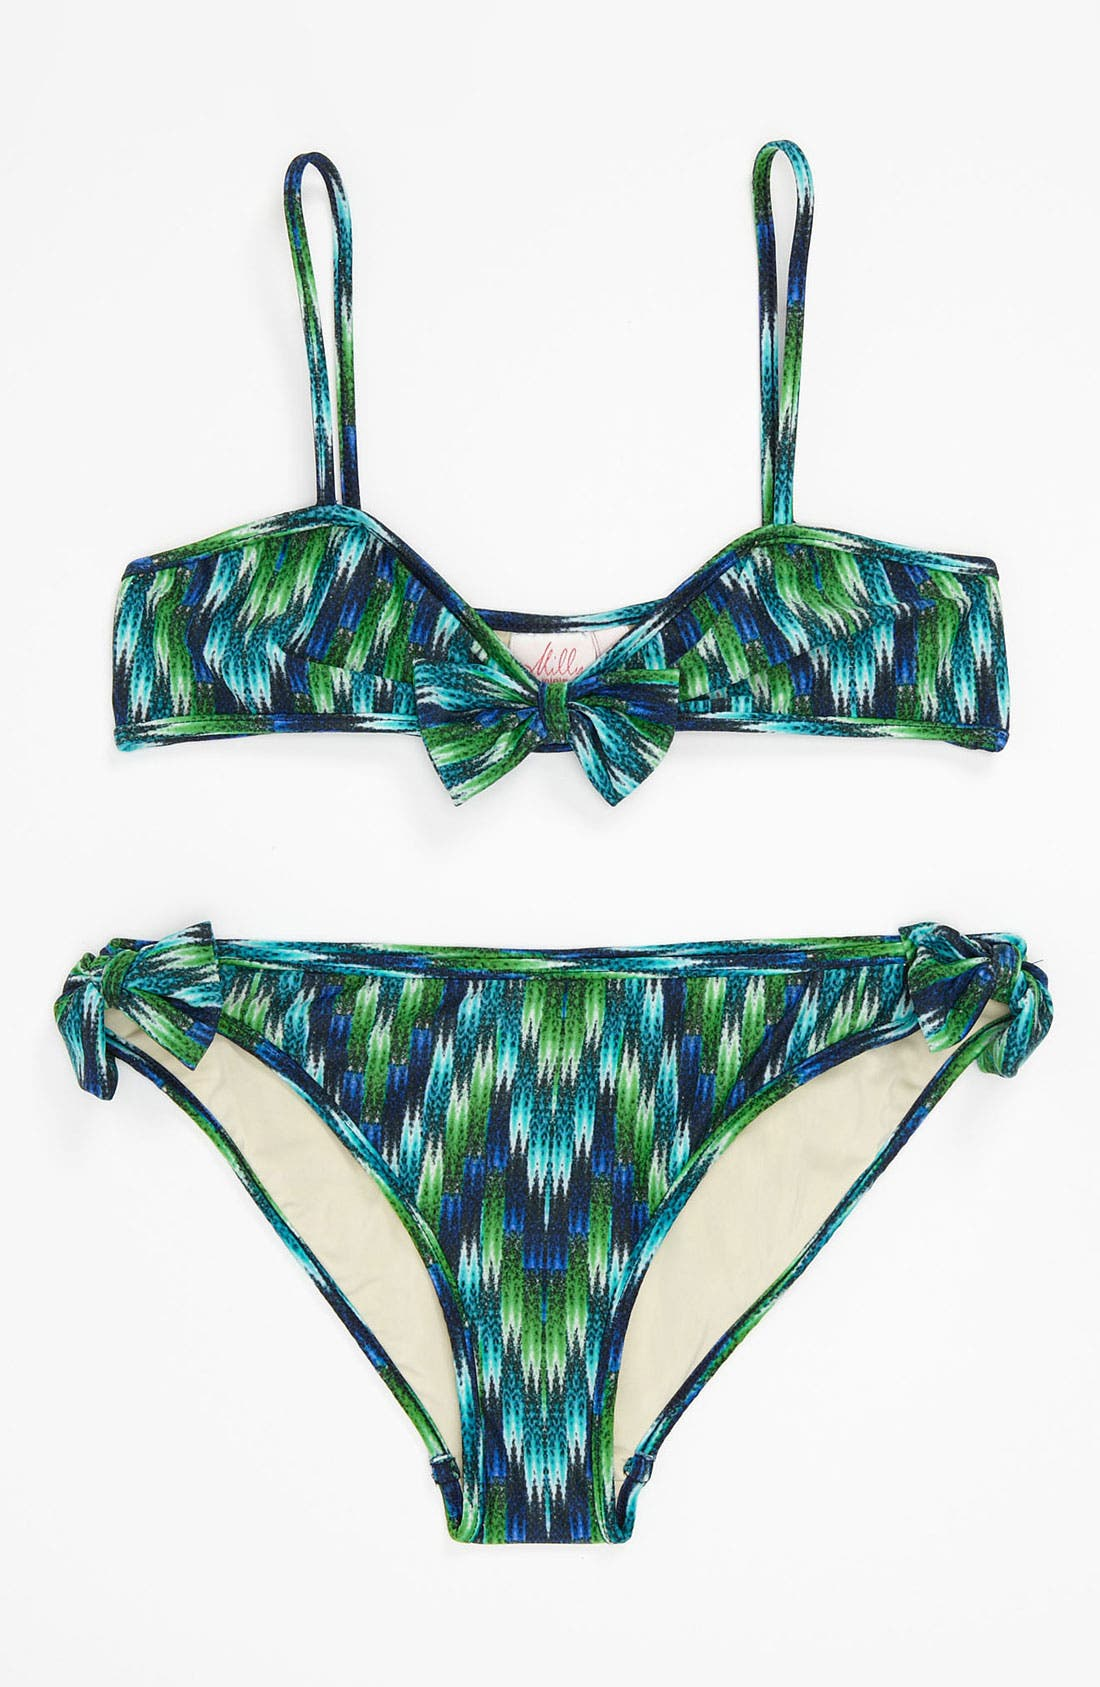 Main Image - Milly Minis 'Sagaponack' Two Piece Bikini Swimsuit (Big Girls)